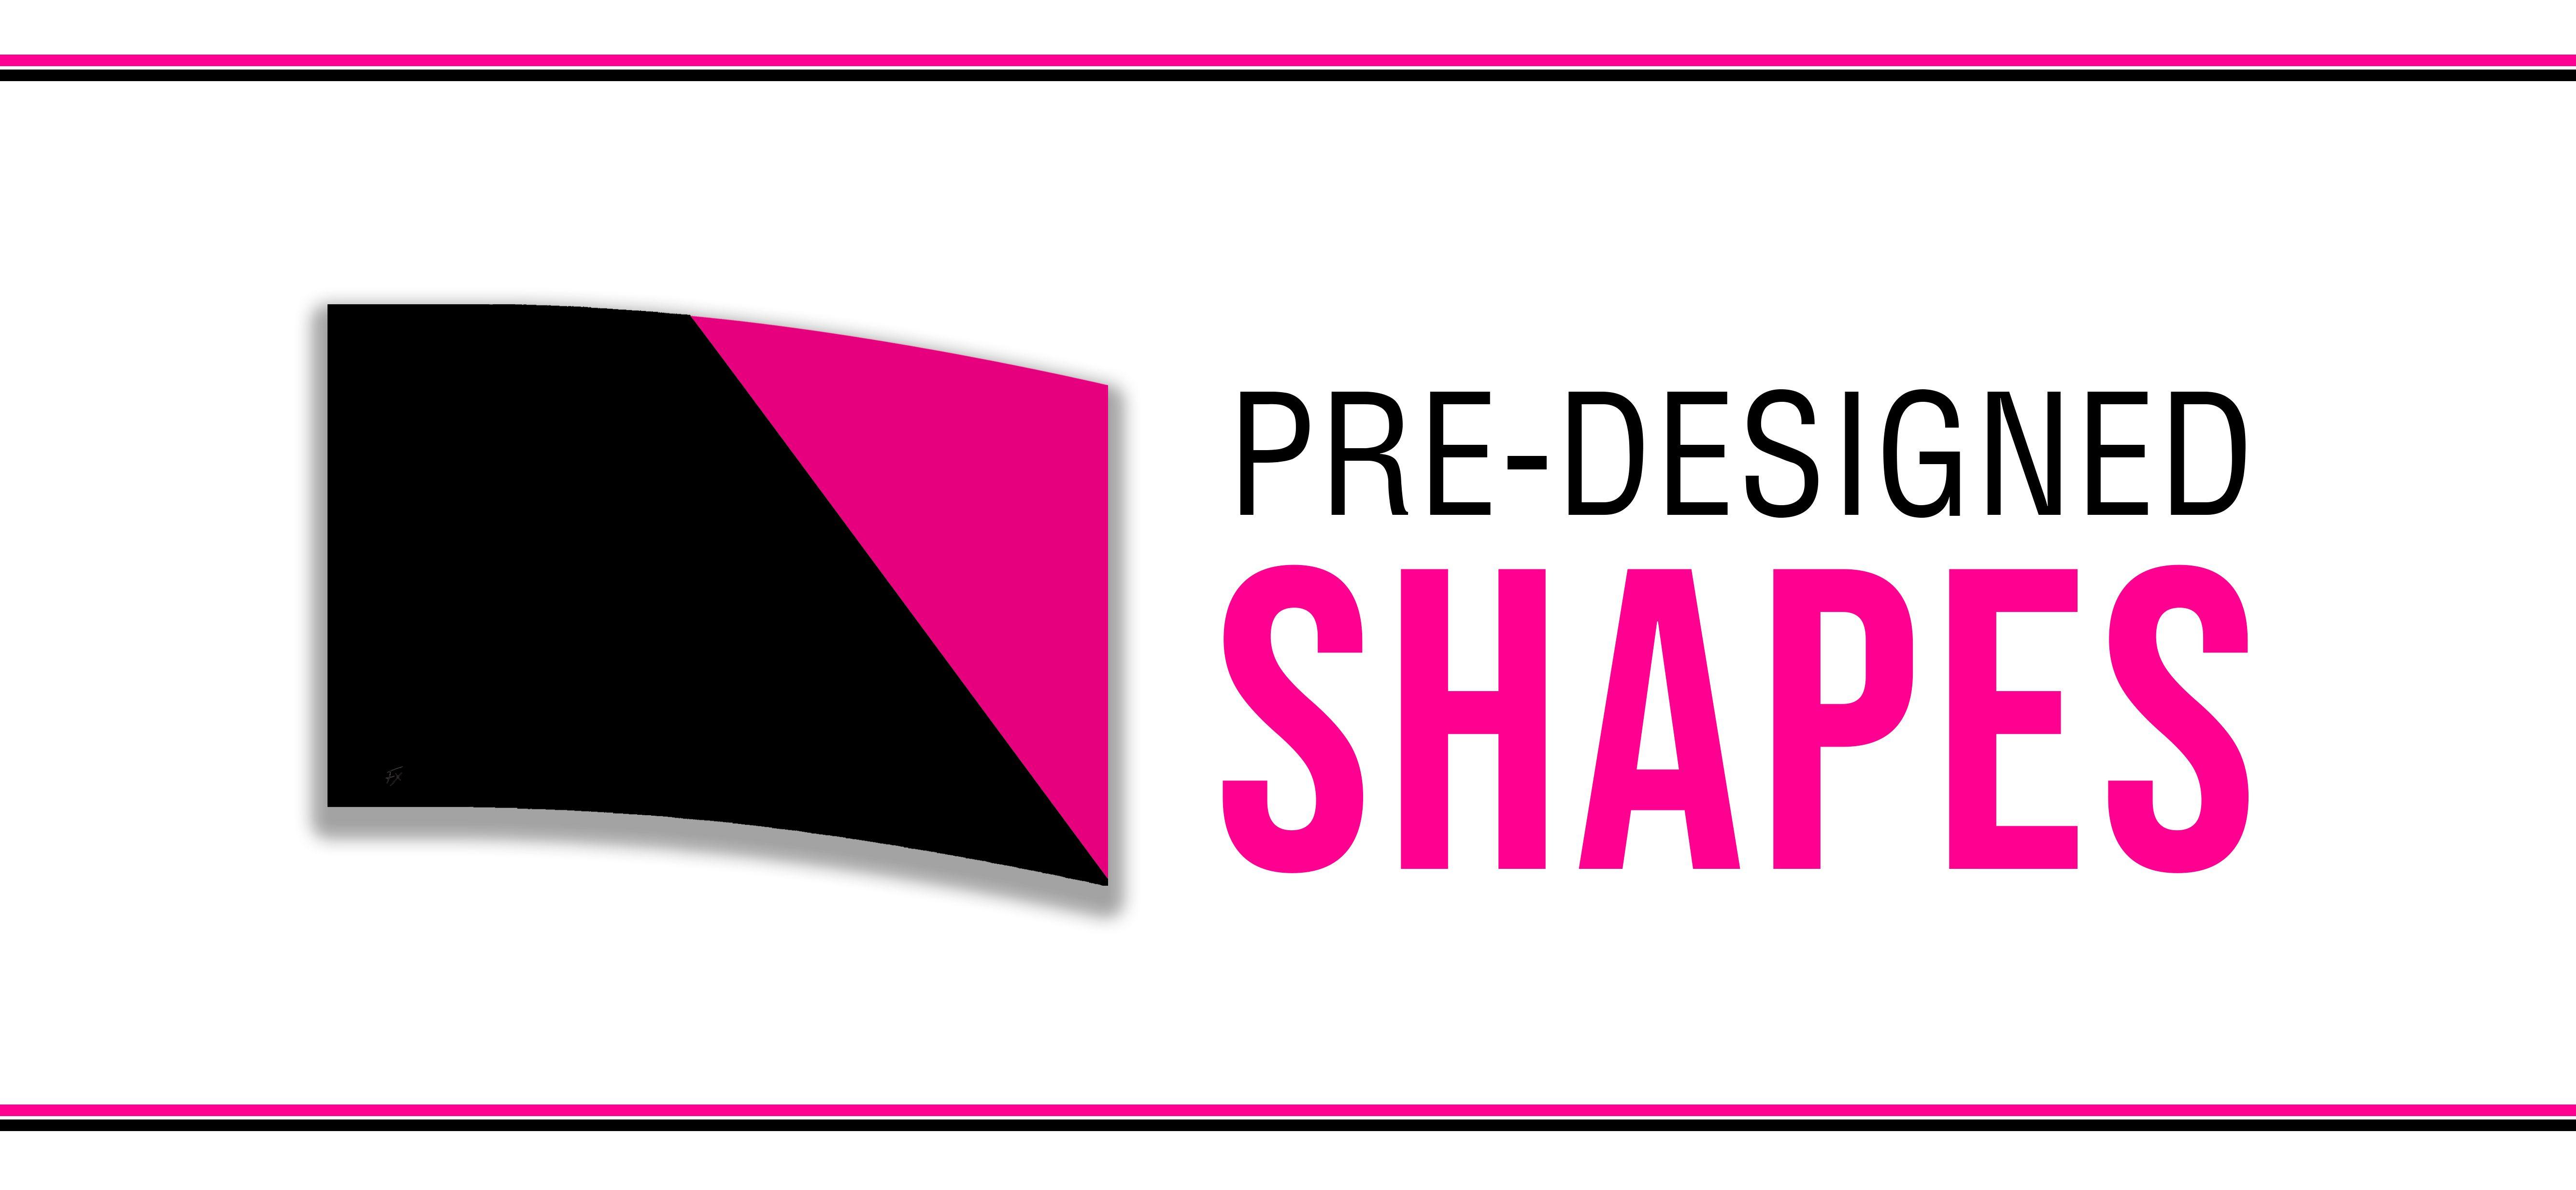 Pre-designed shapes